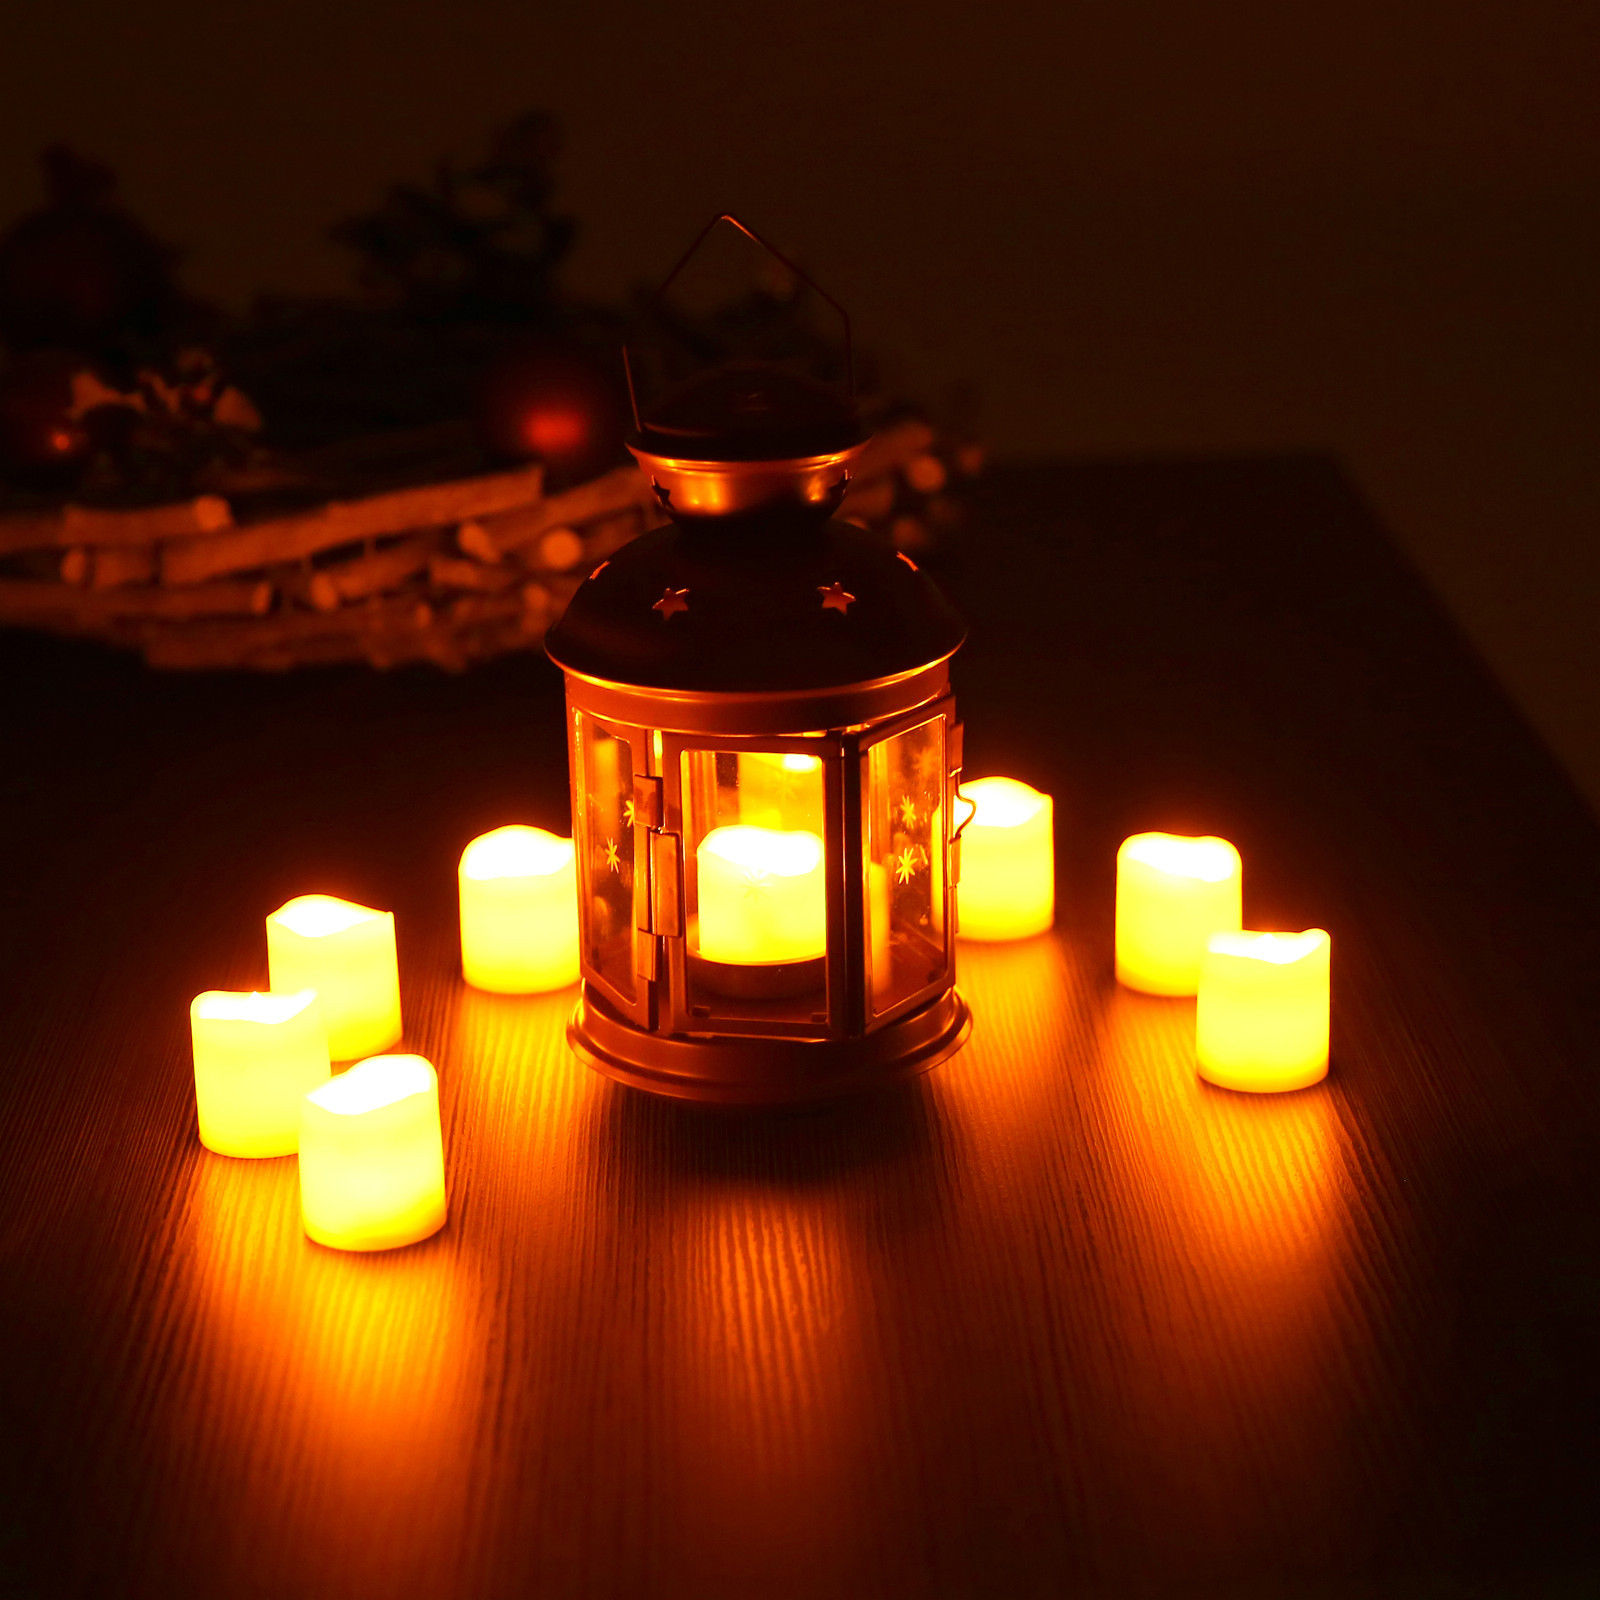 24pz-Candele-Tremolante-Candela-TEALIGHT-a-Led-Luce-Oscillante-Con-Telecomando miniatura 28